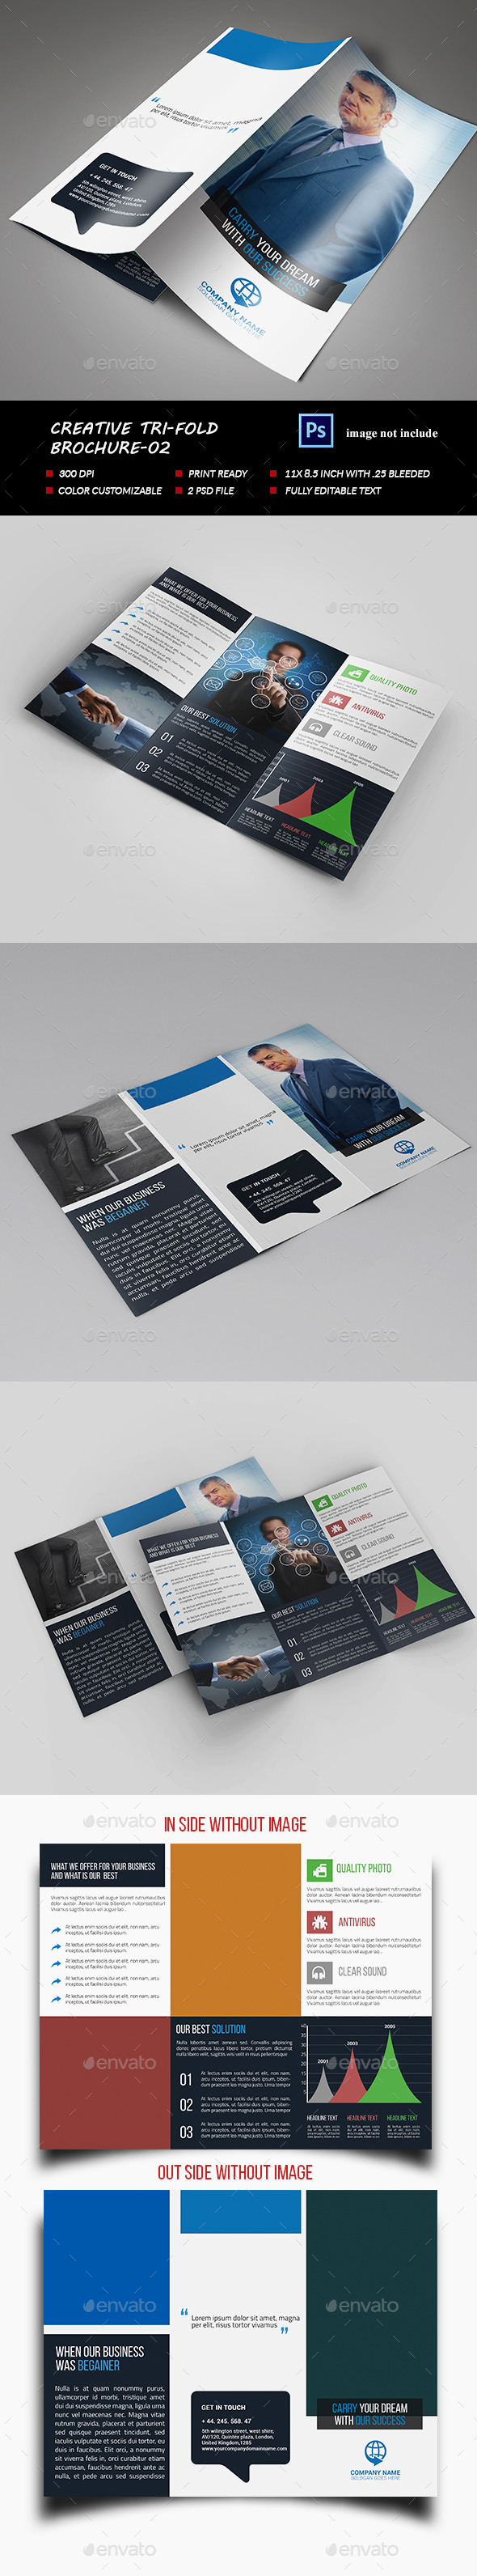 Creative Tri-fold Brochure-02 - Brochures Print Templates